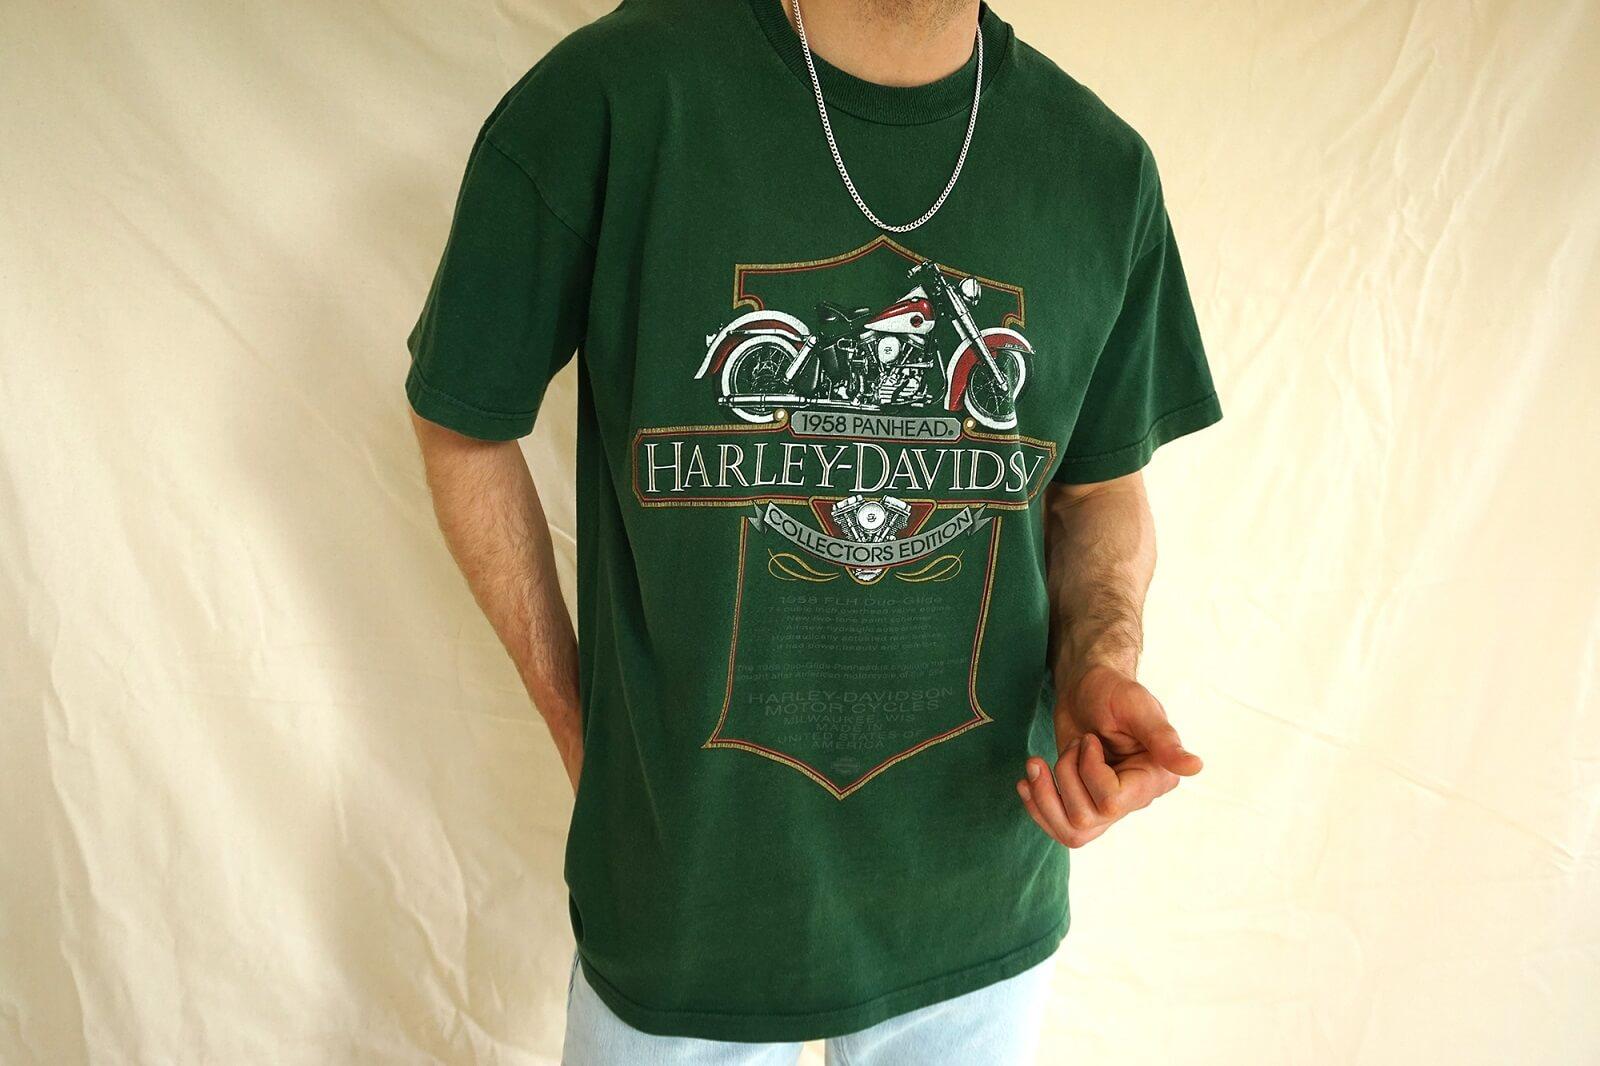 Oversized Vintage Shirt Harley Davidson T-Shirt von Papa Vintage Online Shop